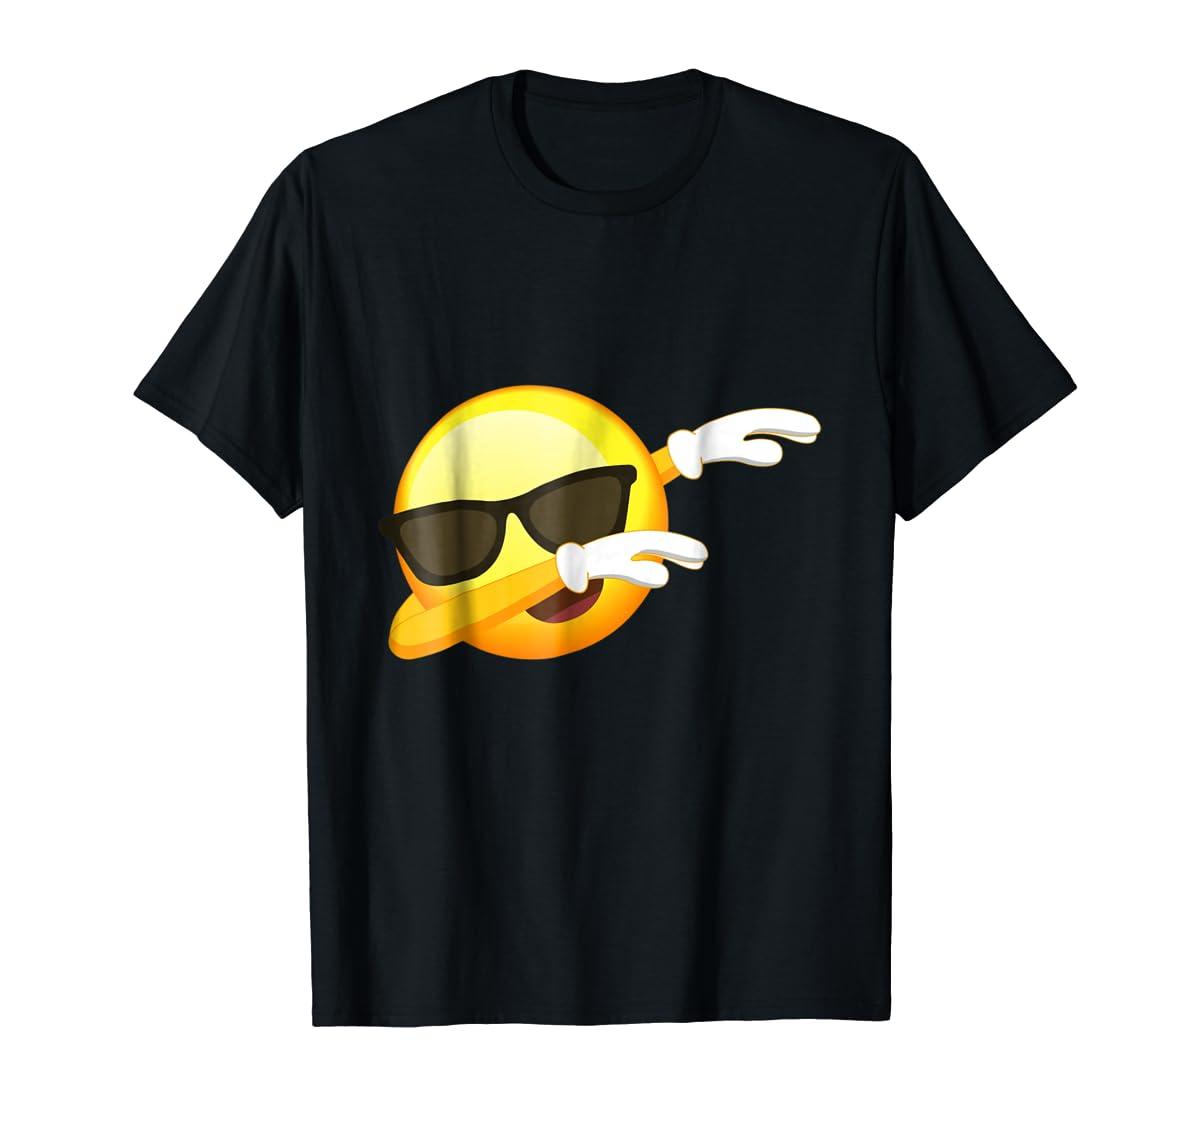 Funny Dabbing Emoji Shirt - Cool Emoji Dab T-Shirt-Men's T-Shirt-Black